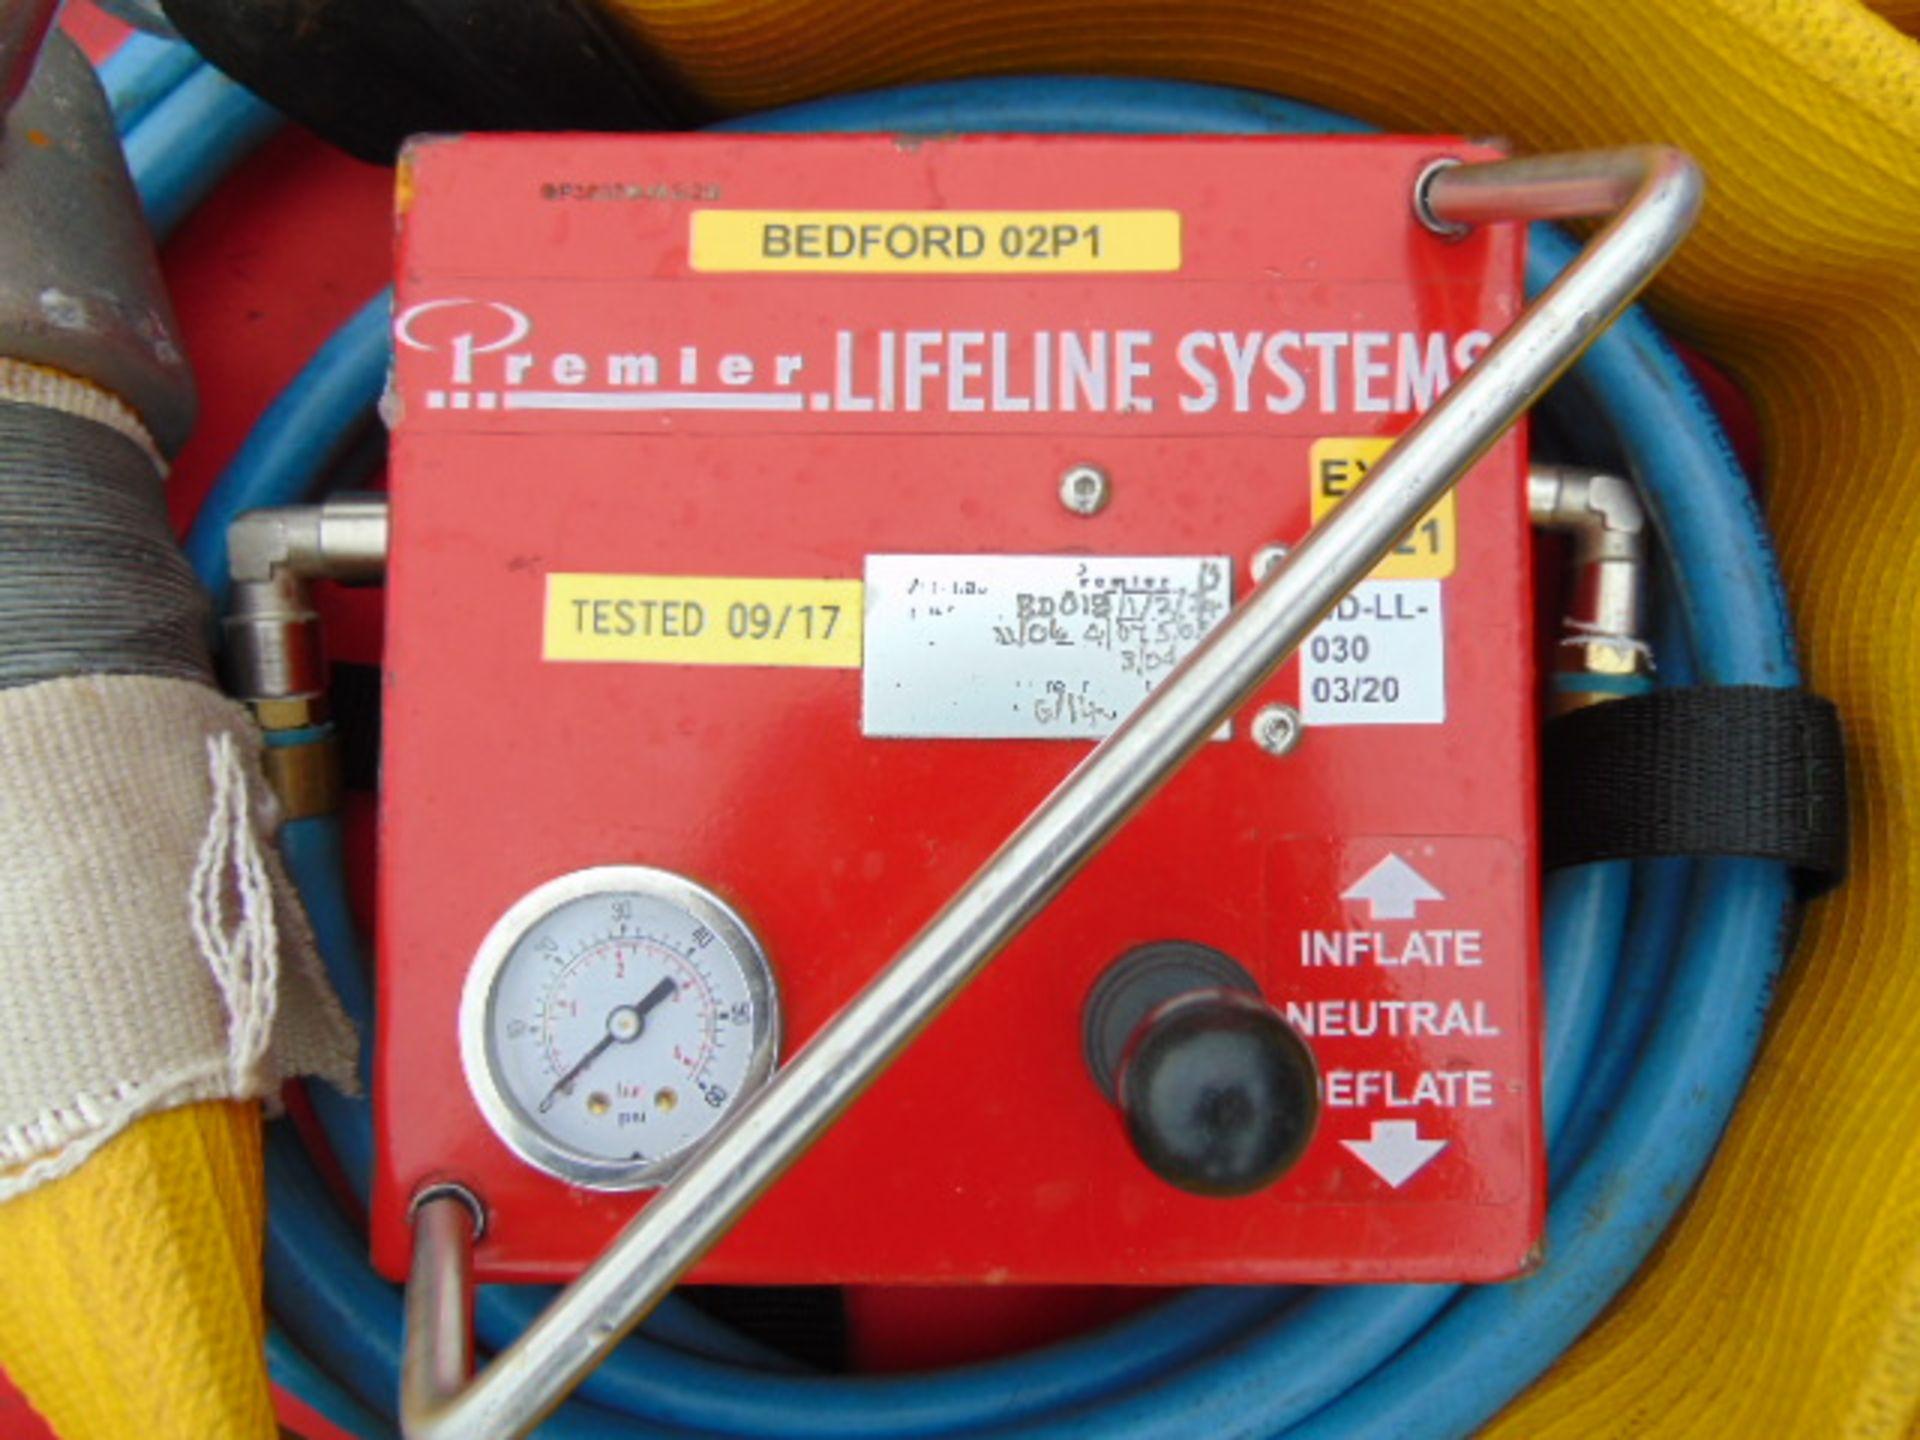 QTY 1 x Premier Lifeline Hose Inflation System - Image 3 of 4